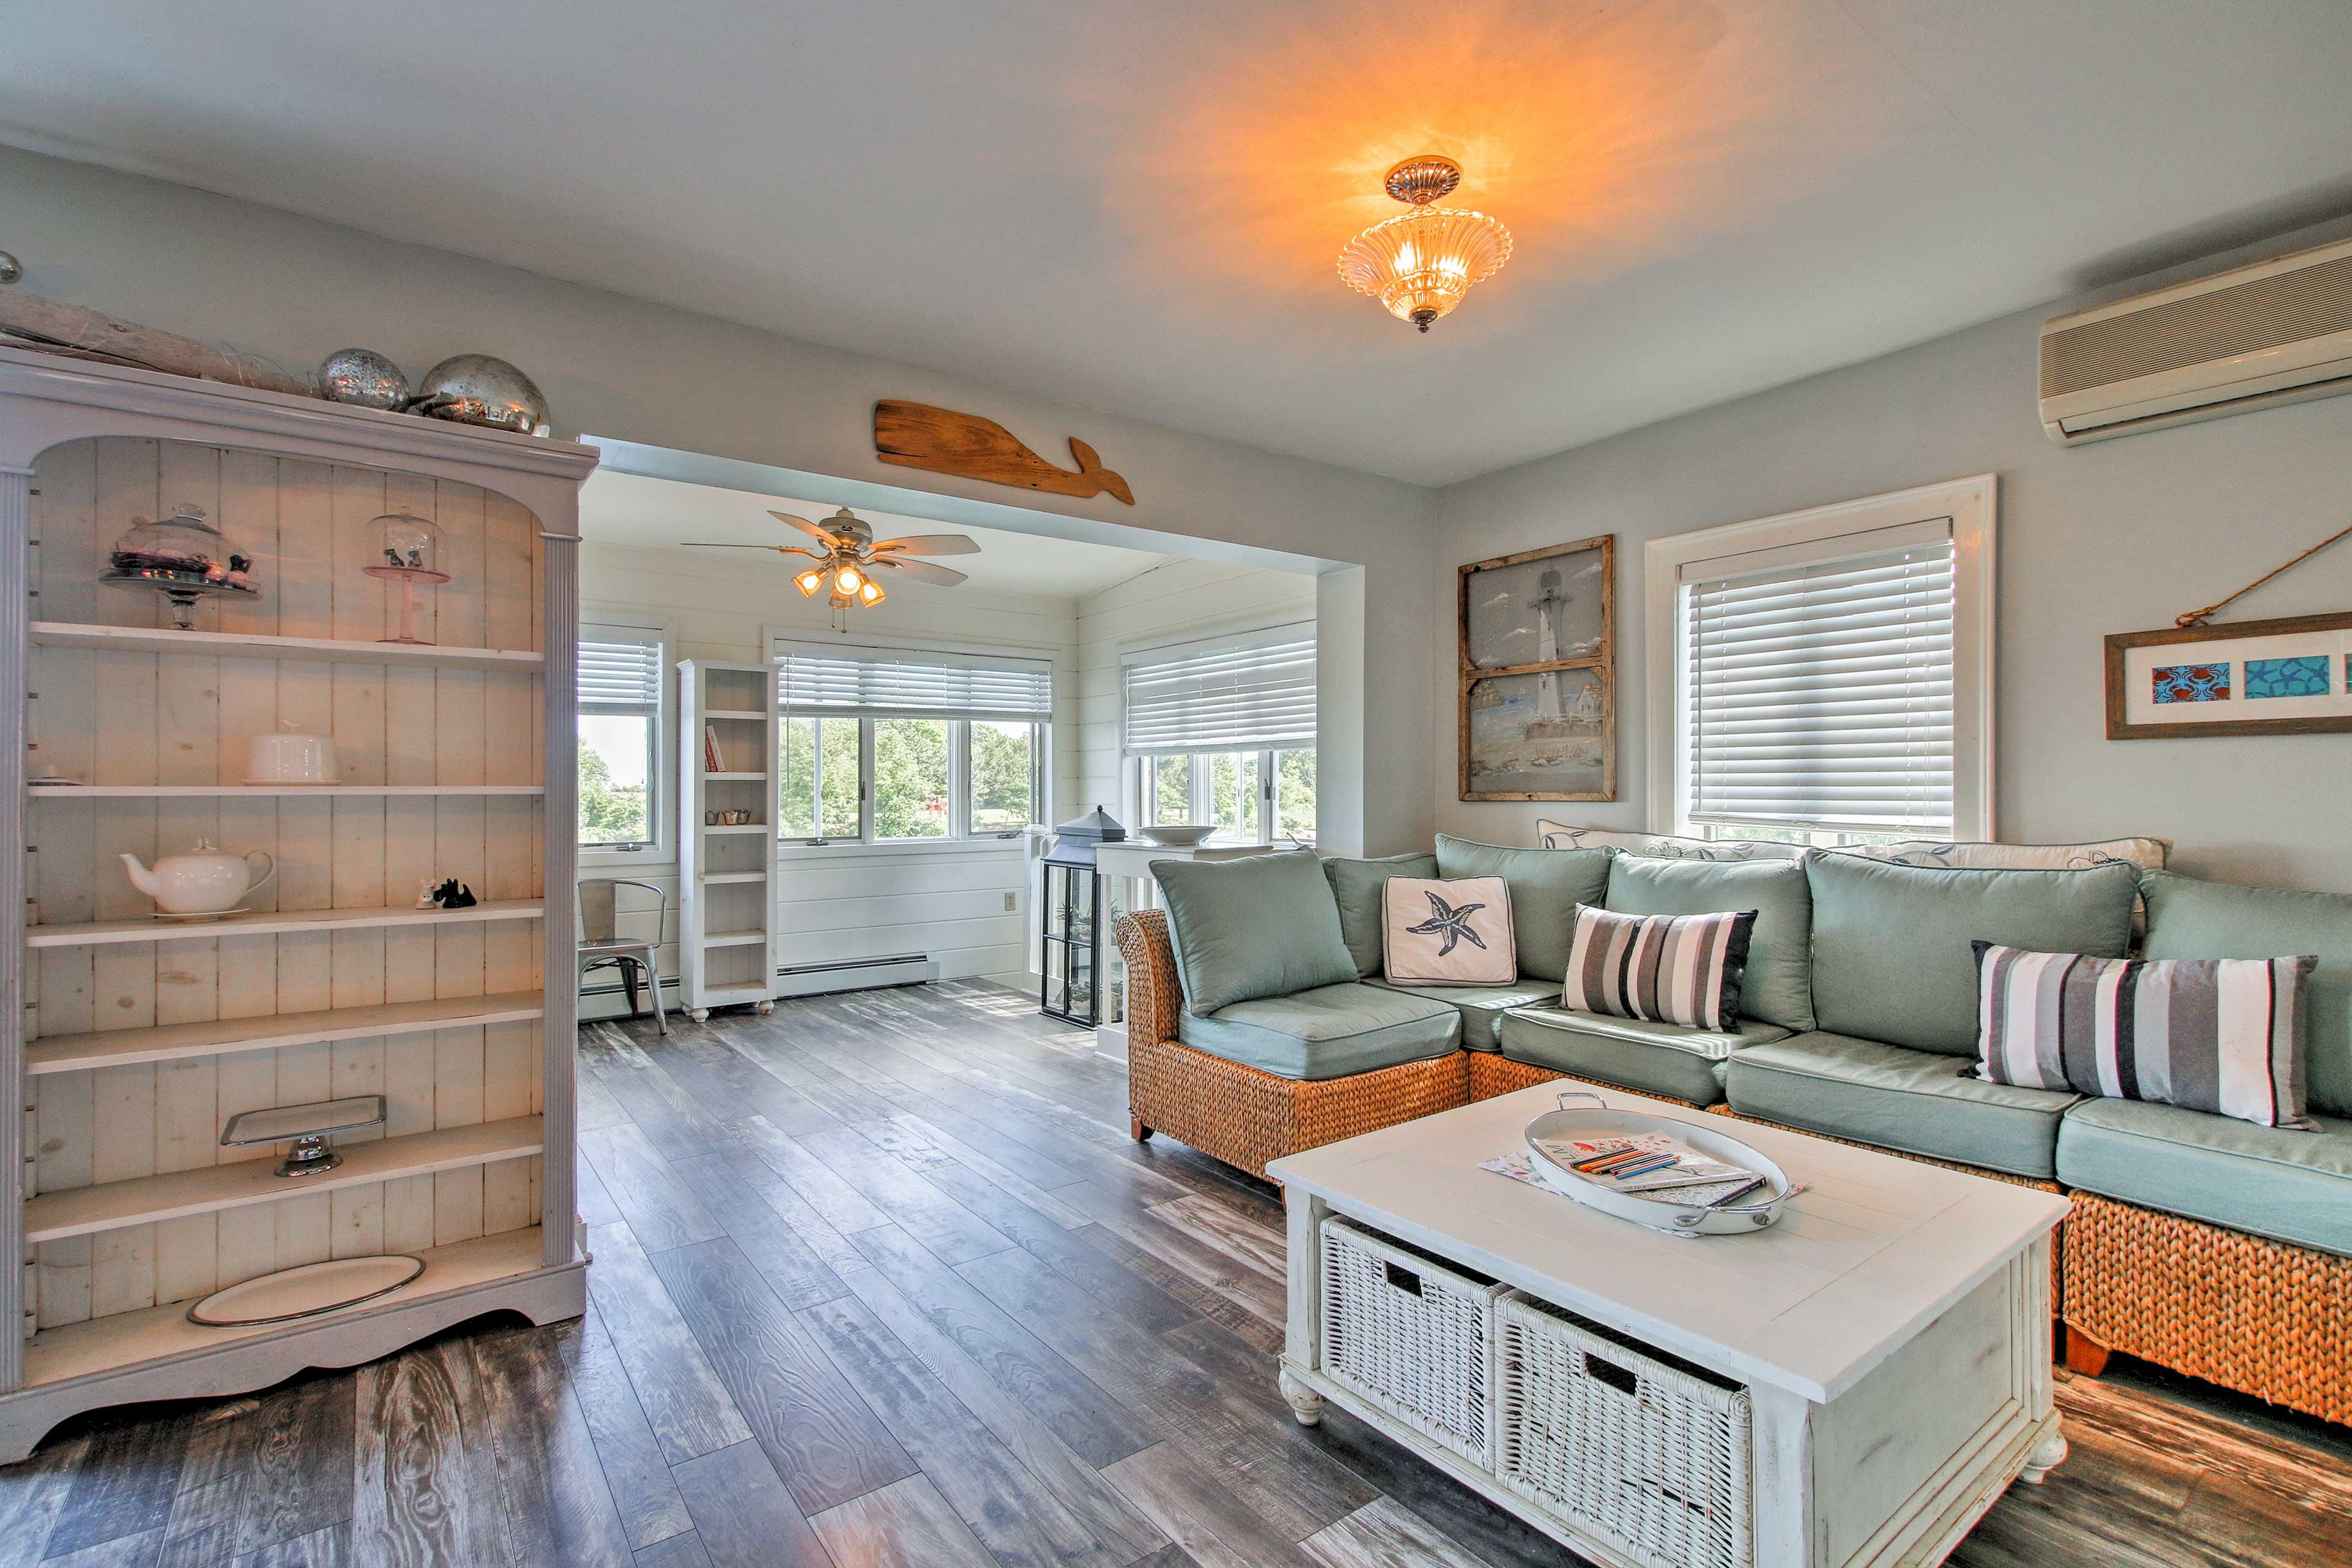 Beach-themed decor adorns each room in the home.